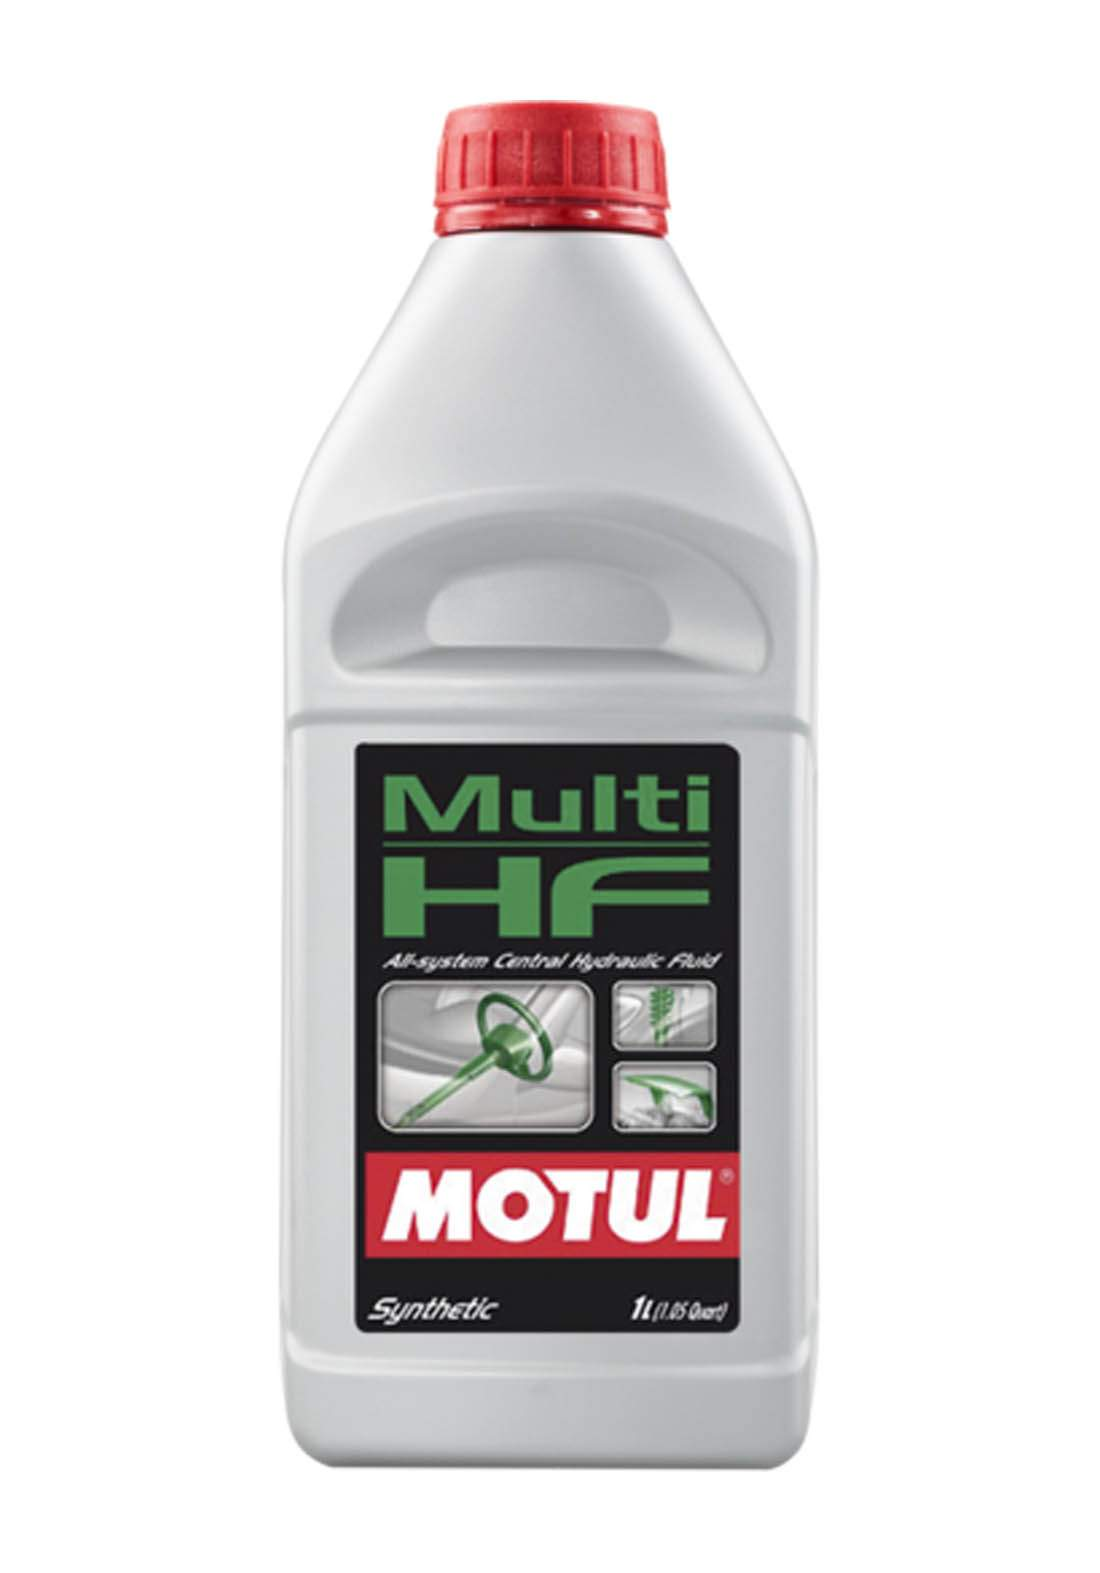 Motul Multi HF Hydraulic Fluid 1pc Fit AUDI  1 L زيت هيدروليك